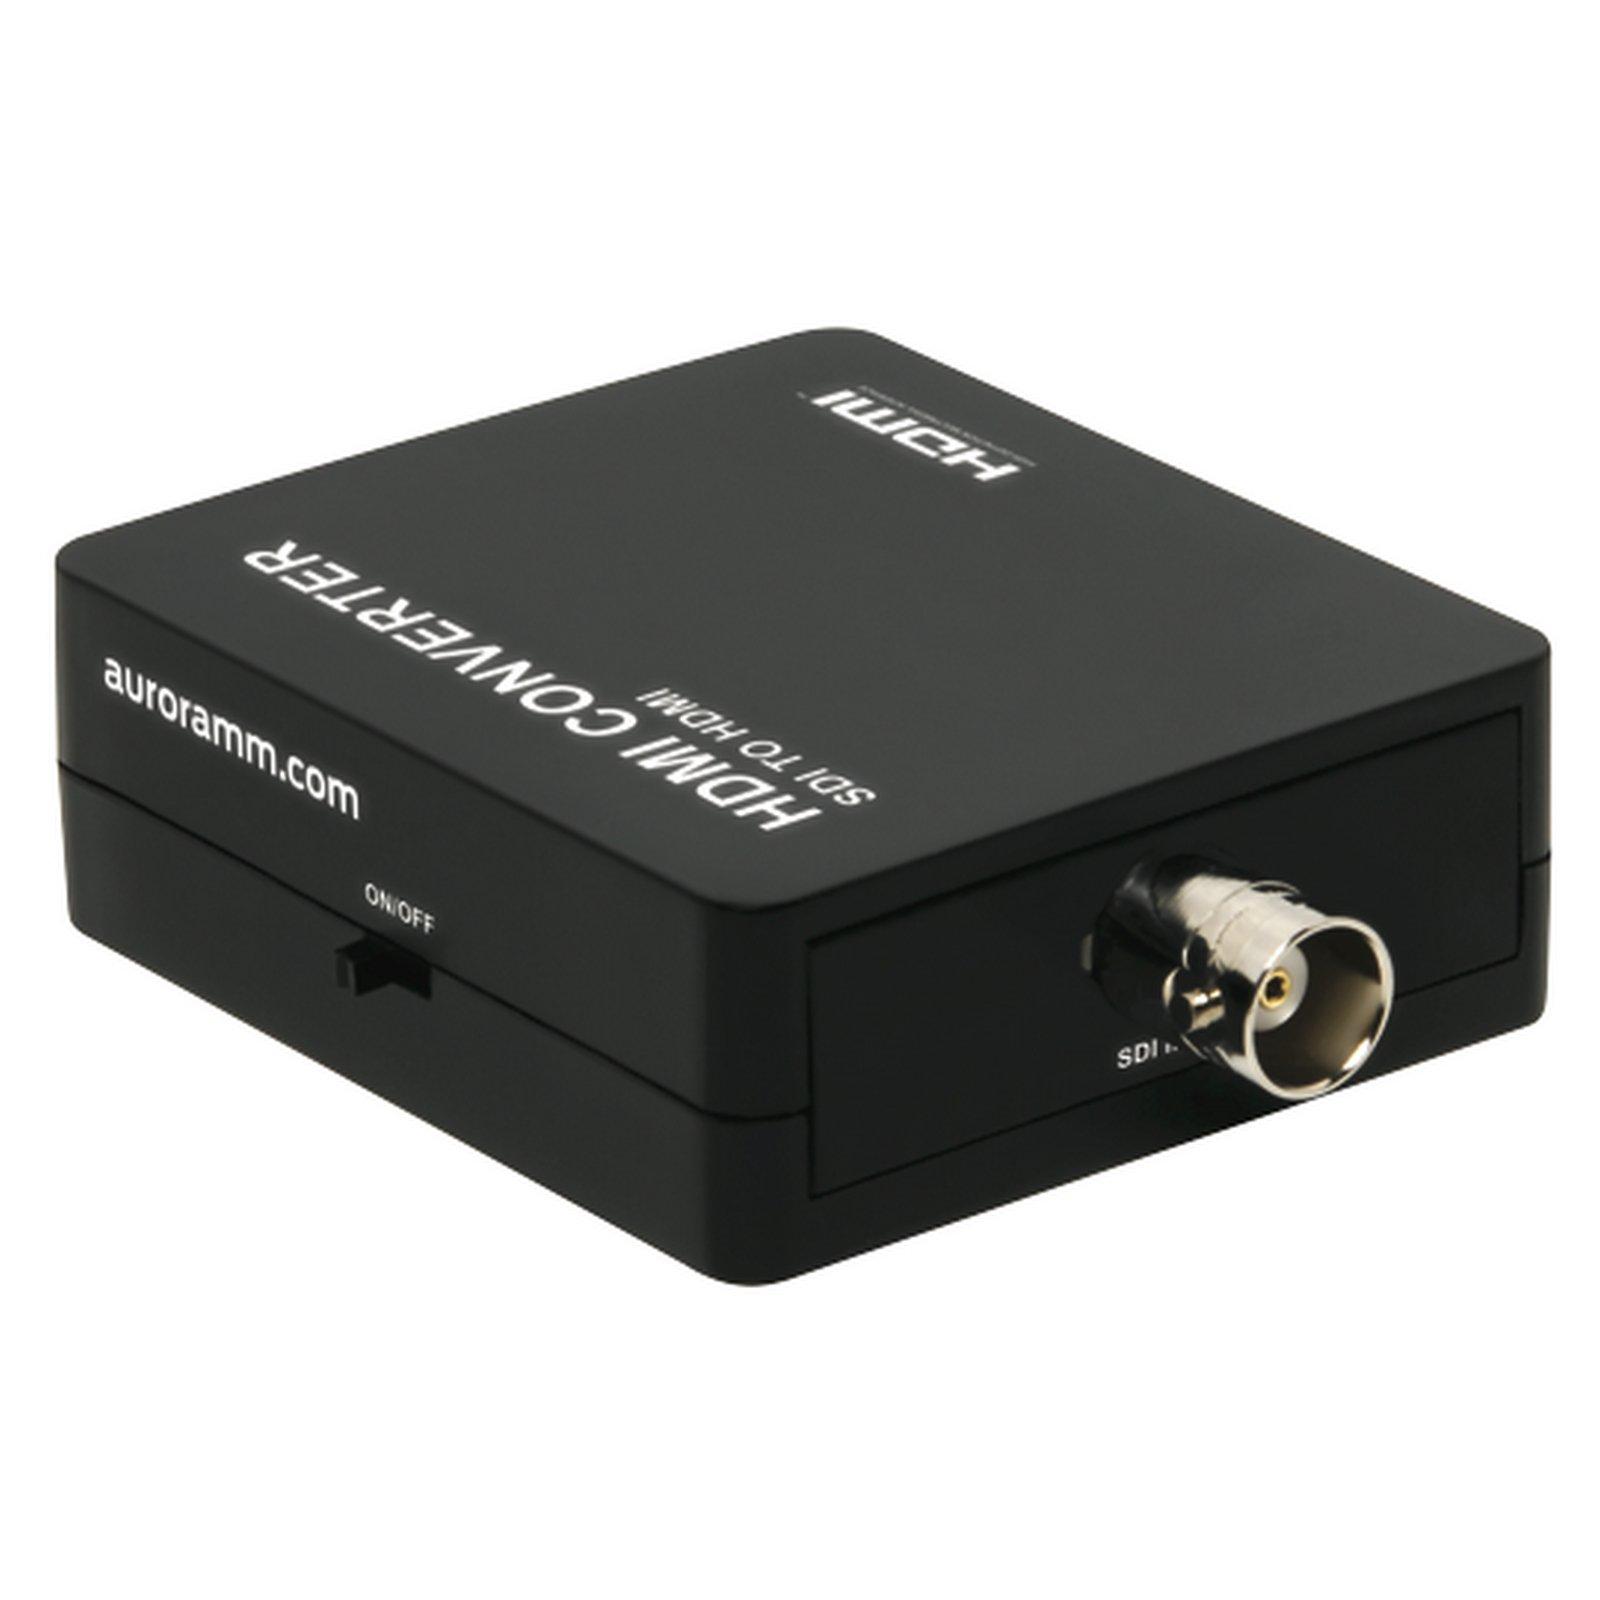 Aurora MCX-STH   SDI to HDMI Audio Video Converter